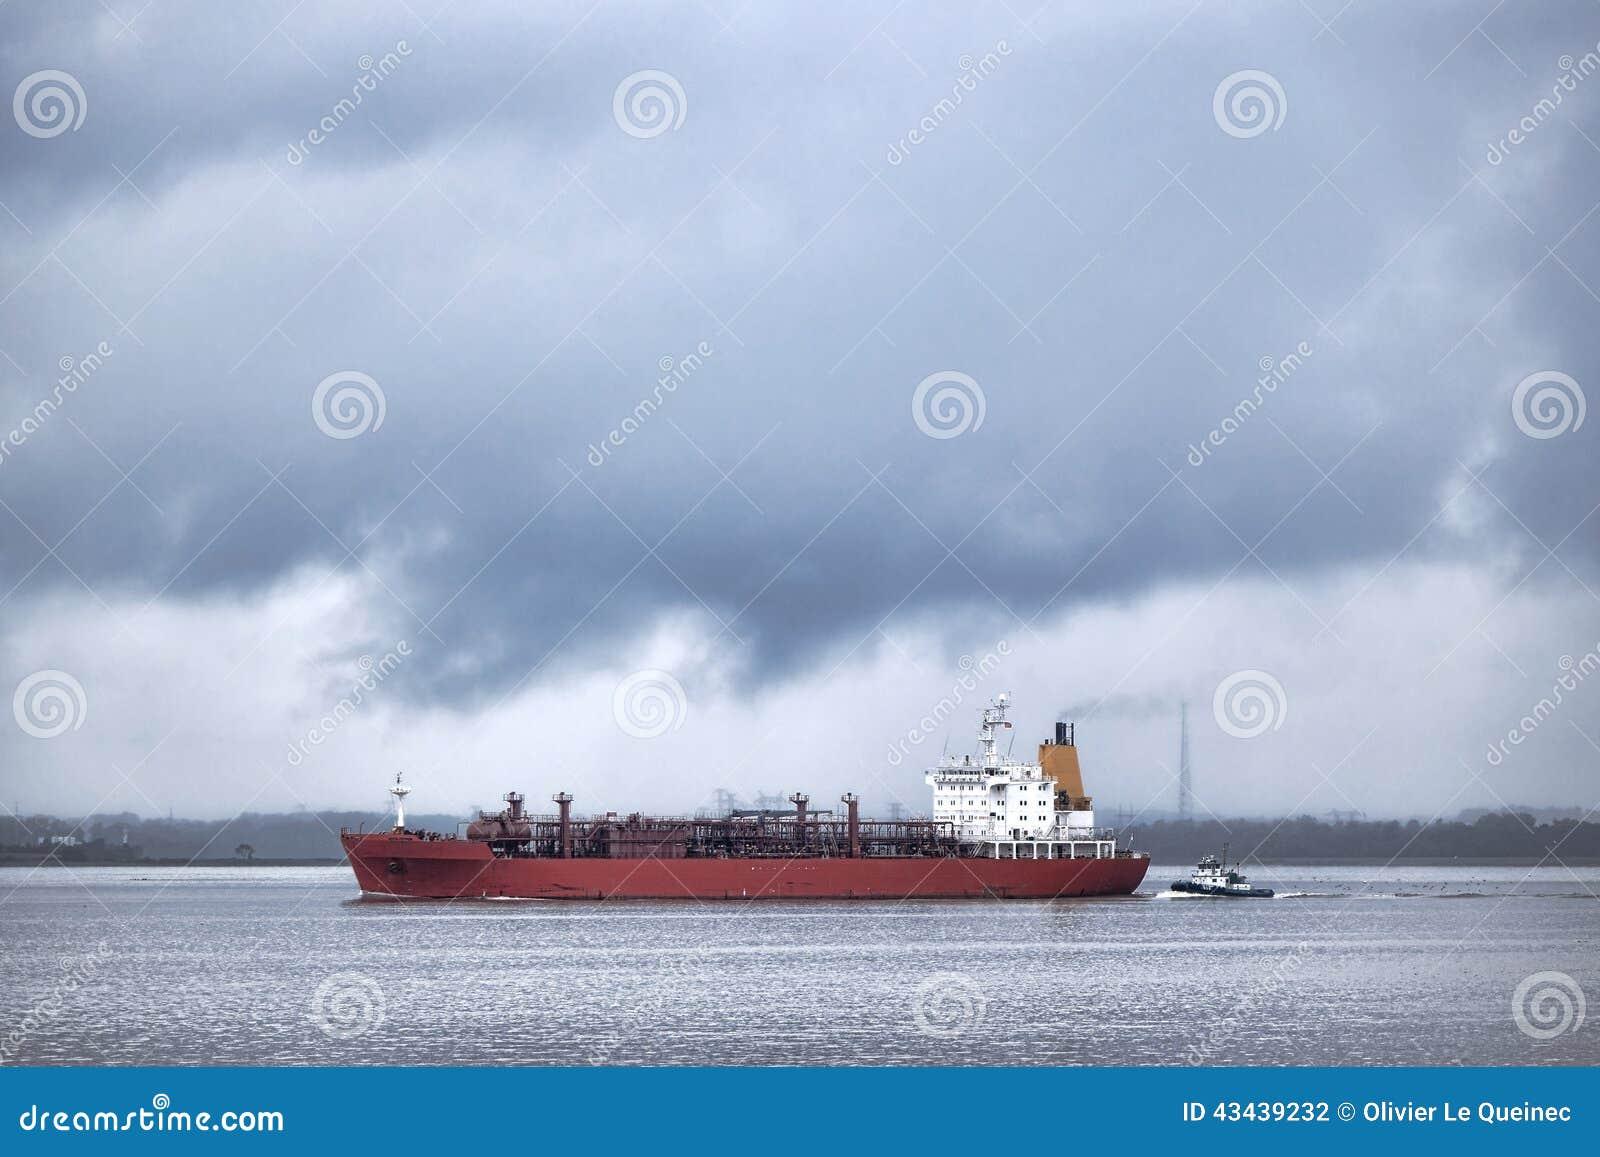 LPG Liquefied Petroleum Gas Tanker Ship Sailing Stock Photo